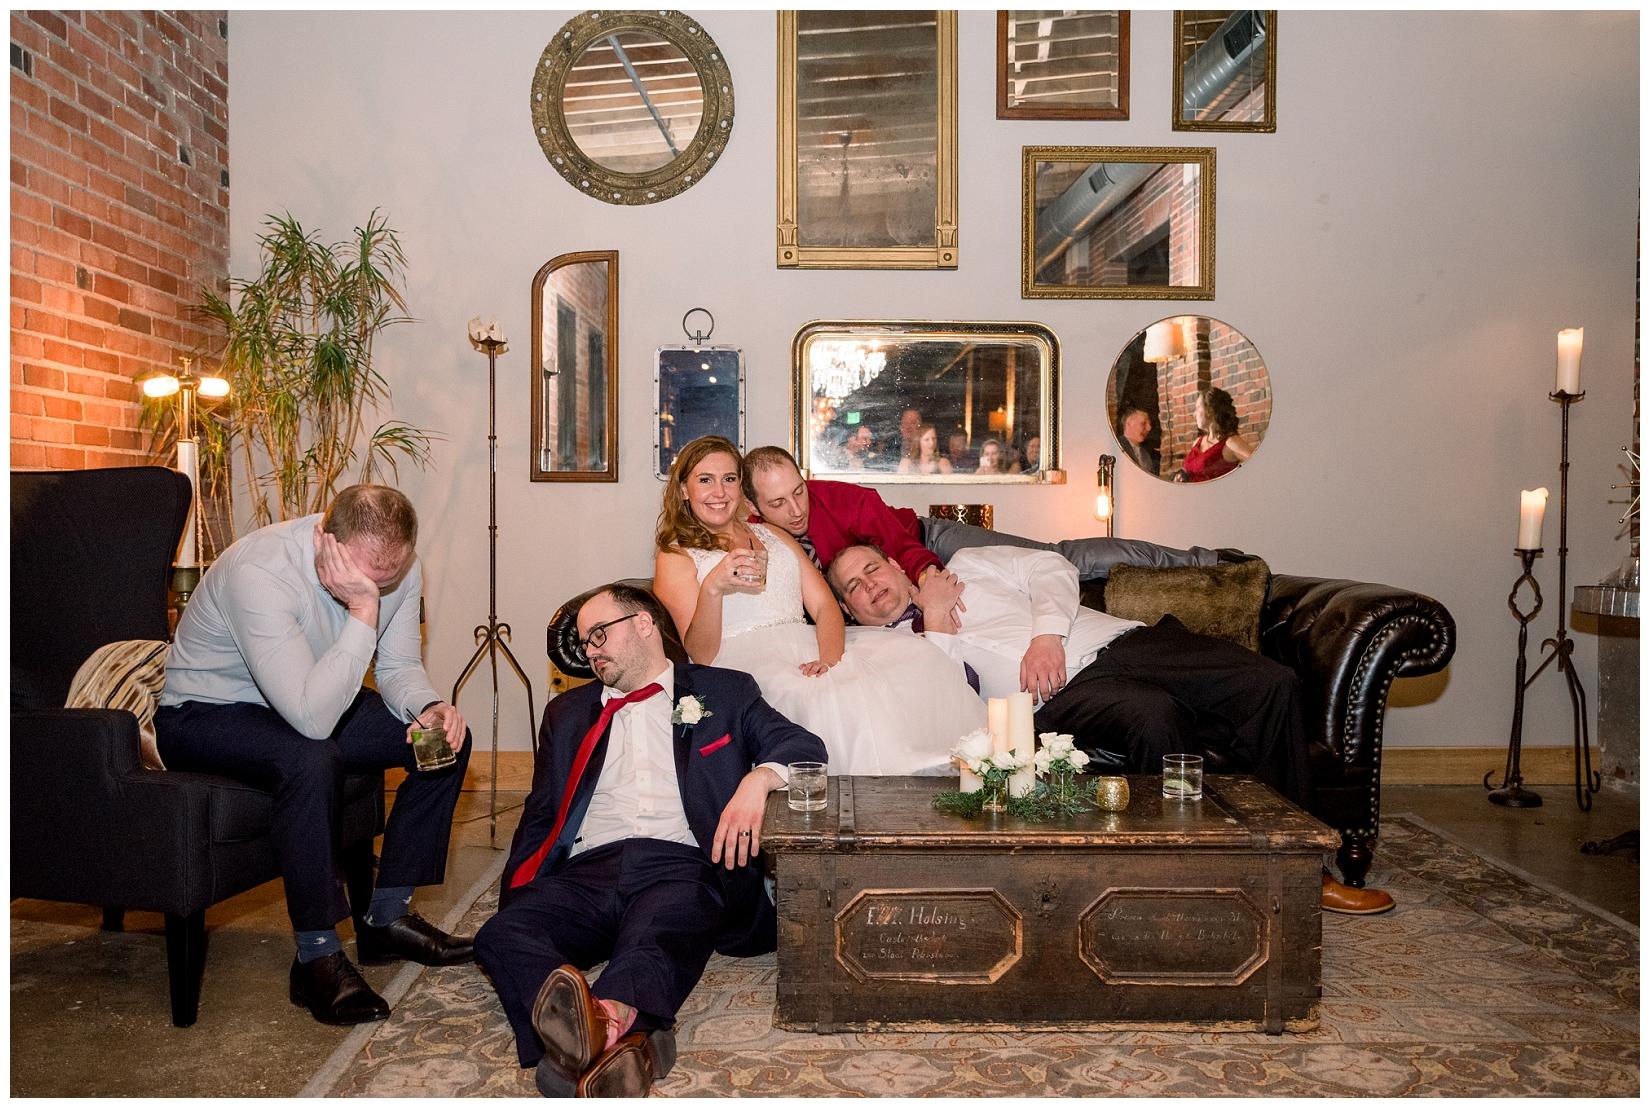 cat-alkire-wedding-photographer-indiana-chicago-indianapolis-fort-wayne_1015.jpg